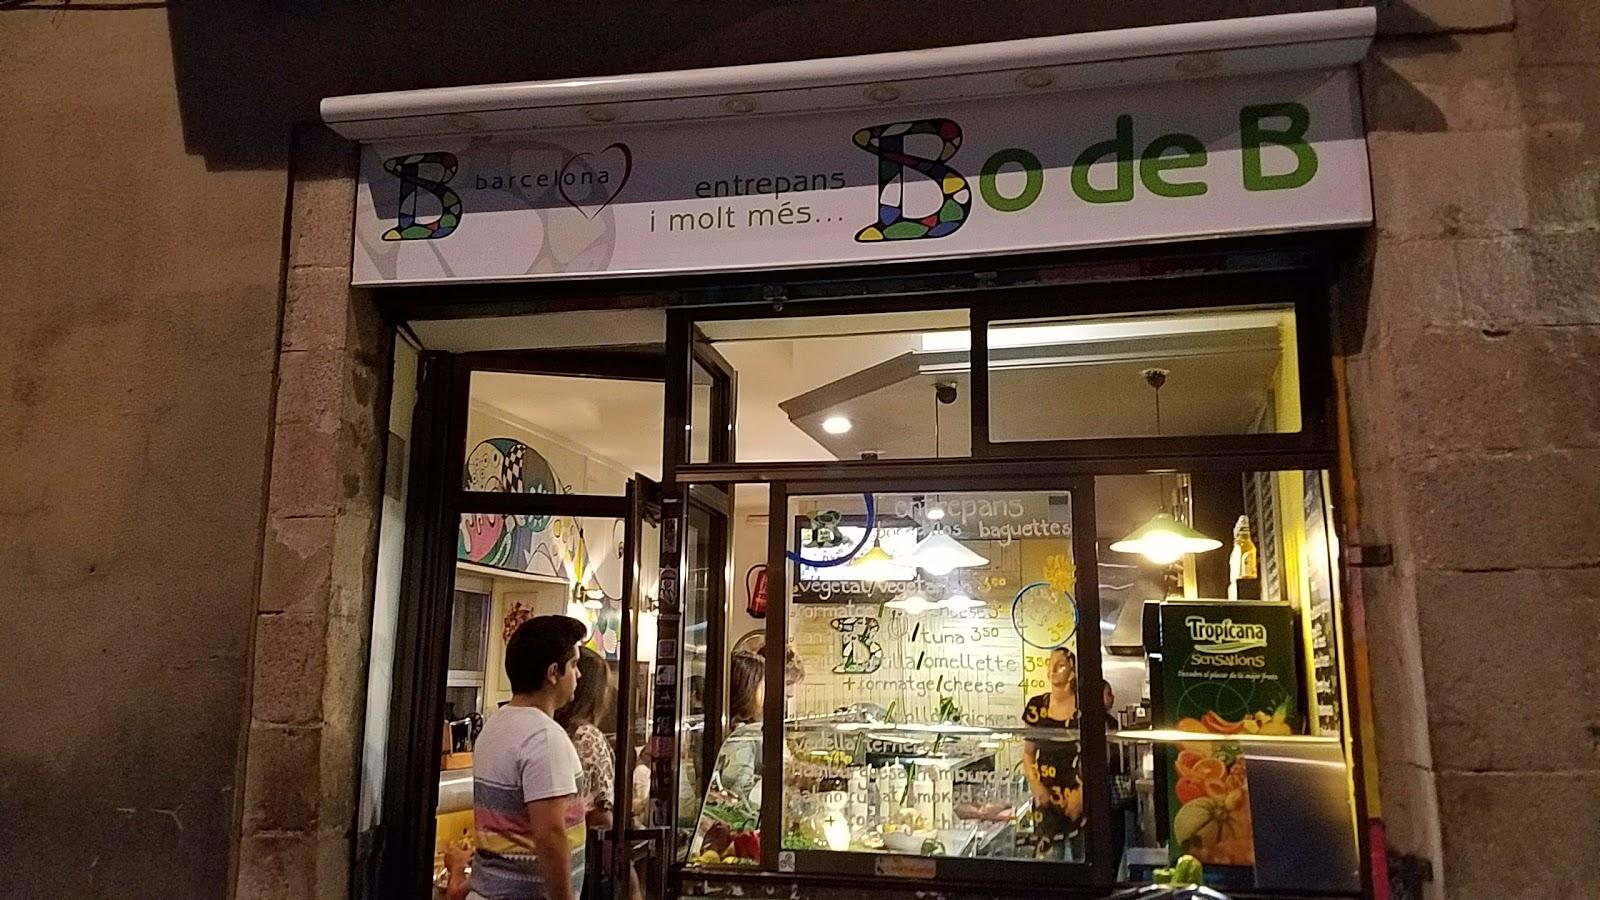 barcelona-guide-erichristian-food-value